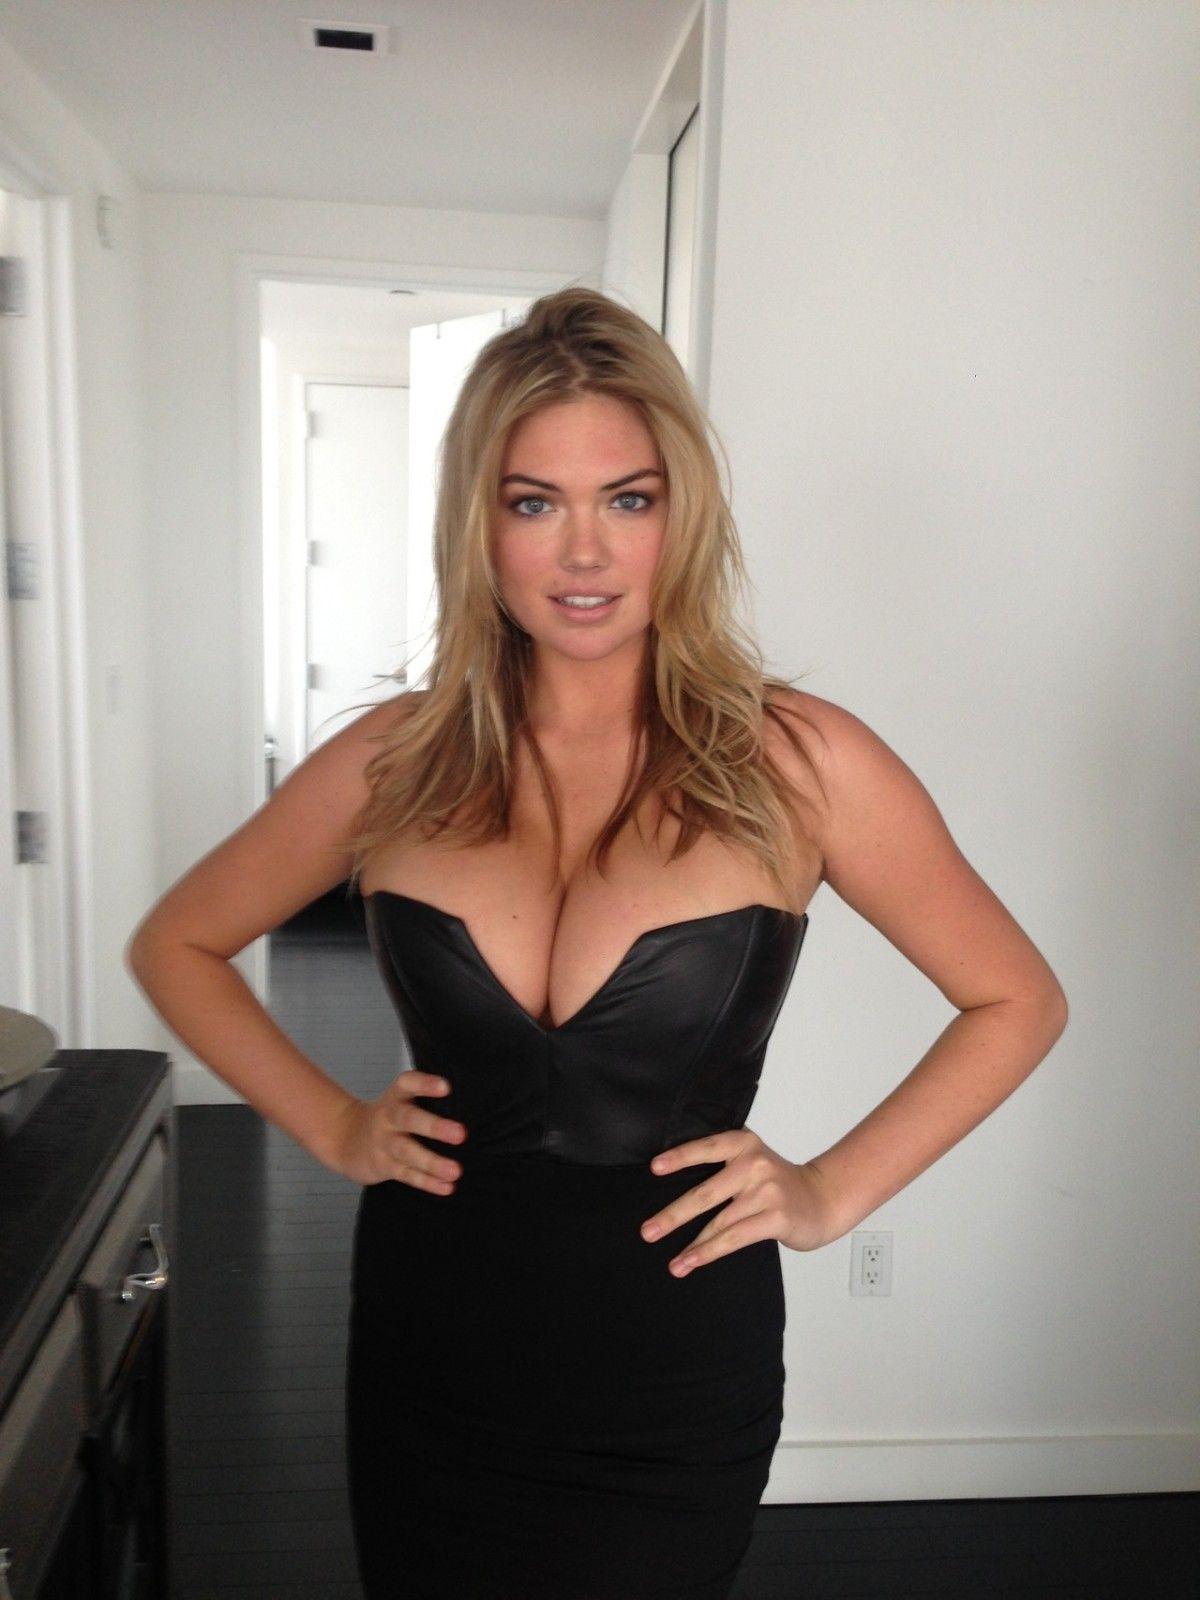 Kate Upton Nude Photos Leak